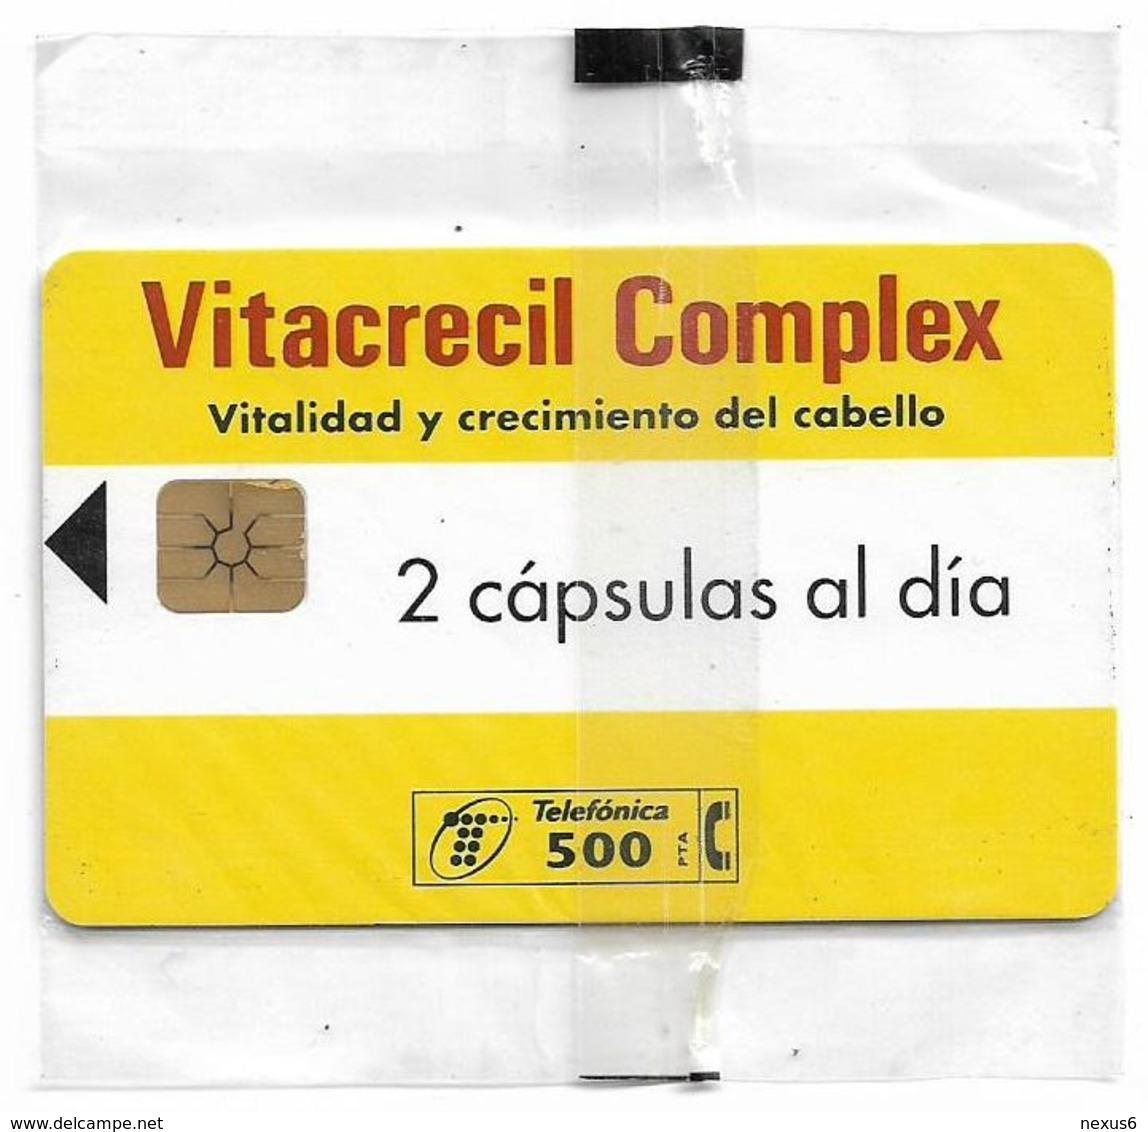 Spain - Telefónica - Vitacrecil Complex - P-322 - 03.1998, 500PTA, 13.000ex, NSB - España